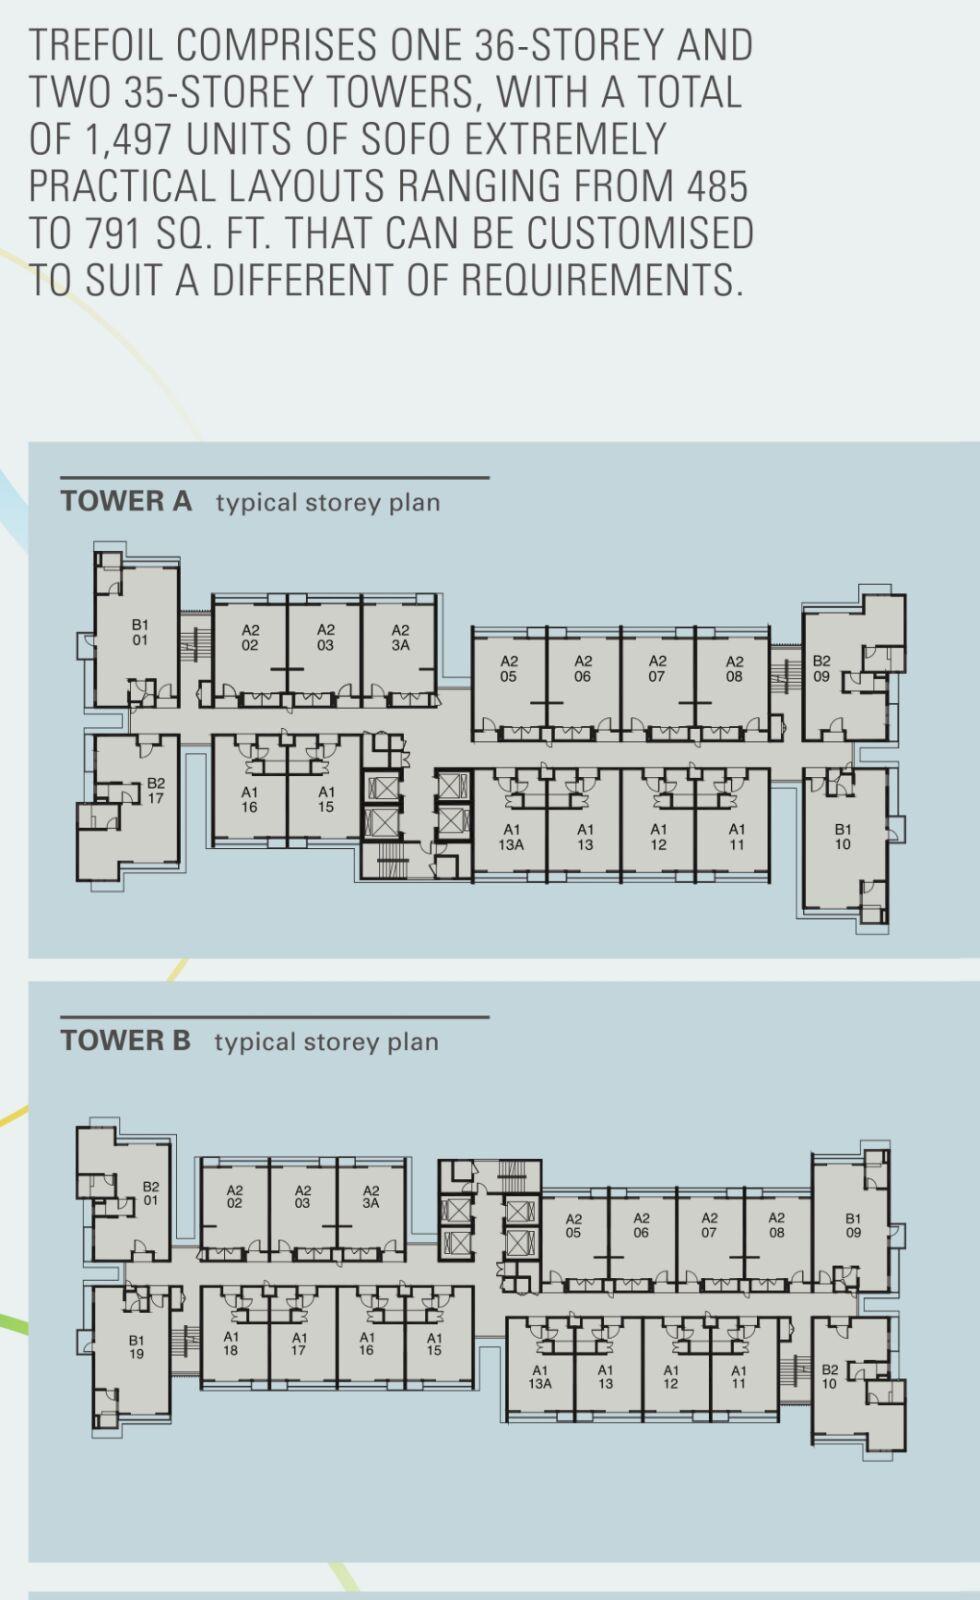 Trefoil Setia City Floor Plan Google Search How To Plan Floor Plans Layout